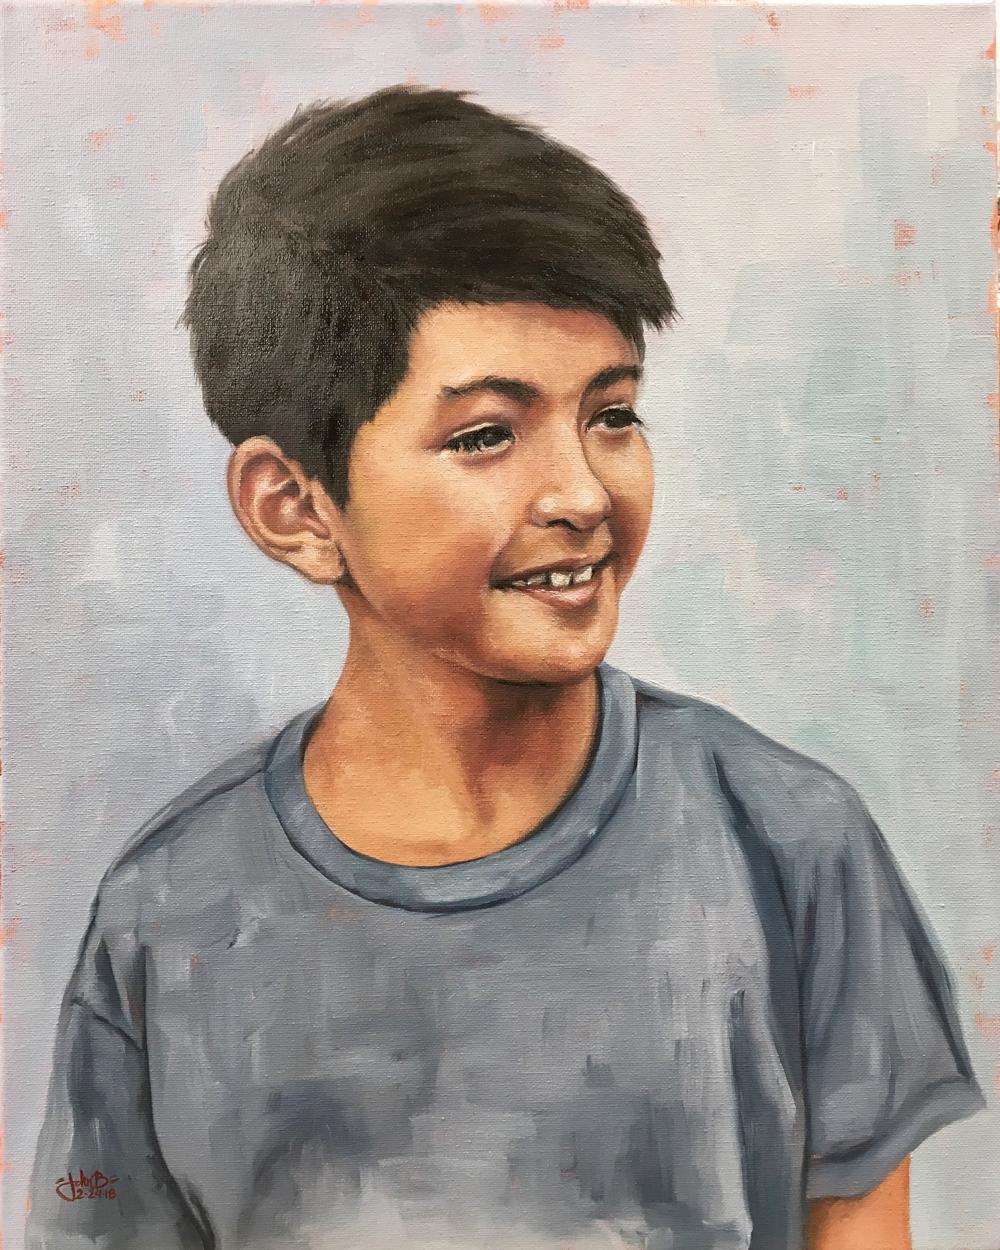 john-barrick-portrait-painting-ezekiel-web.jpg